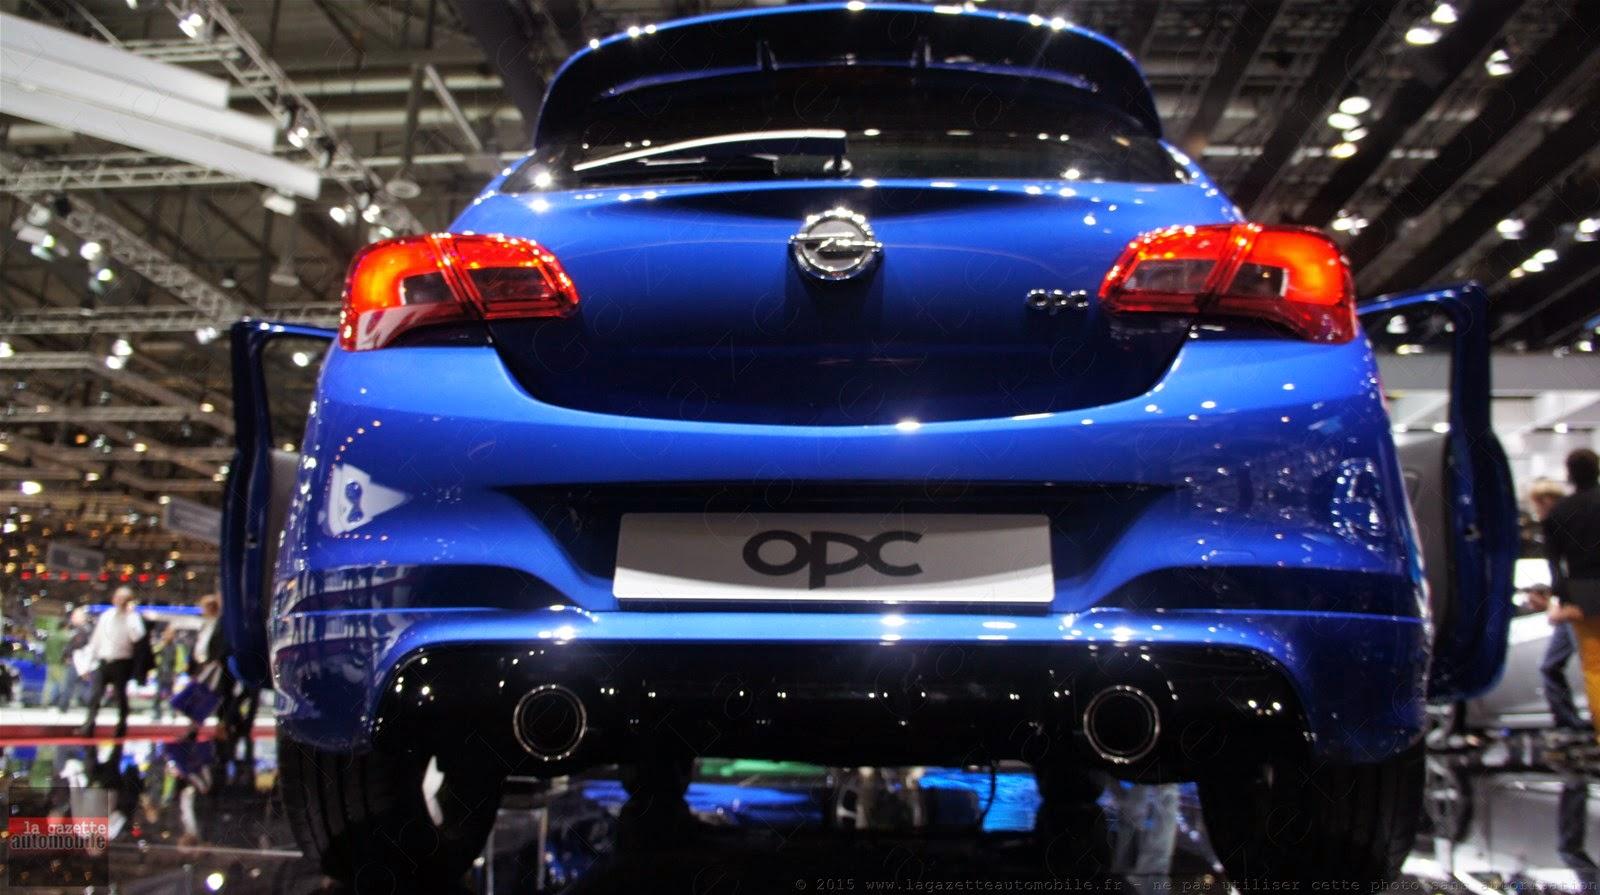 Genève 2015 Opel Corsa E OPC